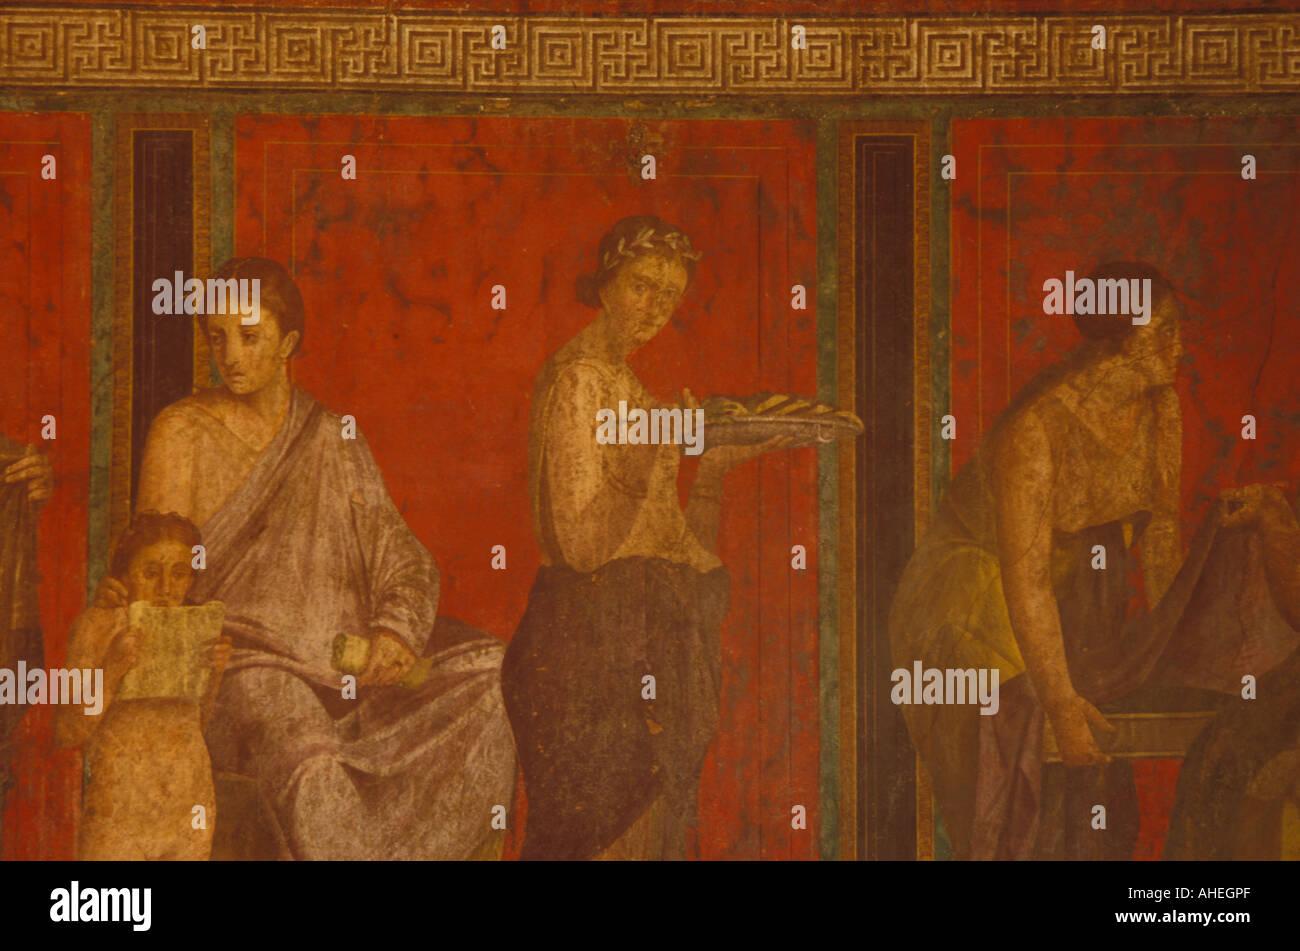 Cult of Dionysus fresco Villa of the Mysteries Pompeii Italy - Stock Image